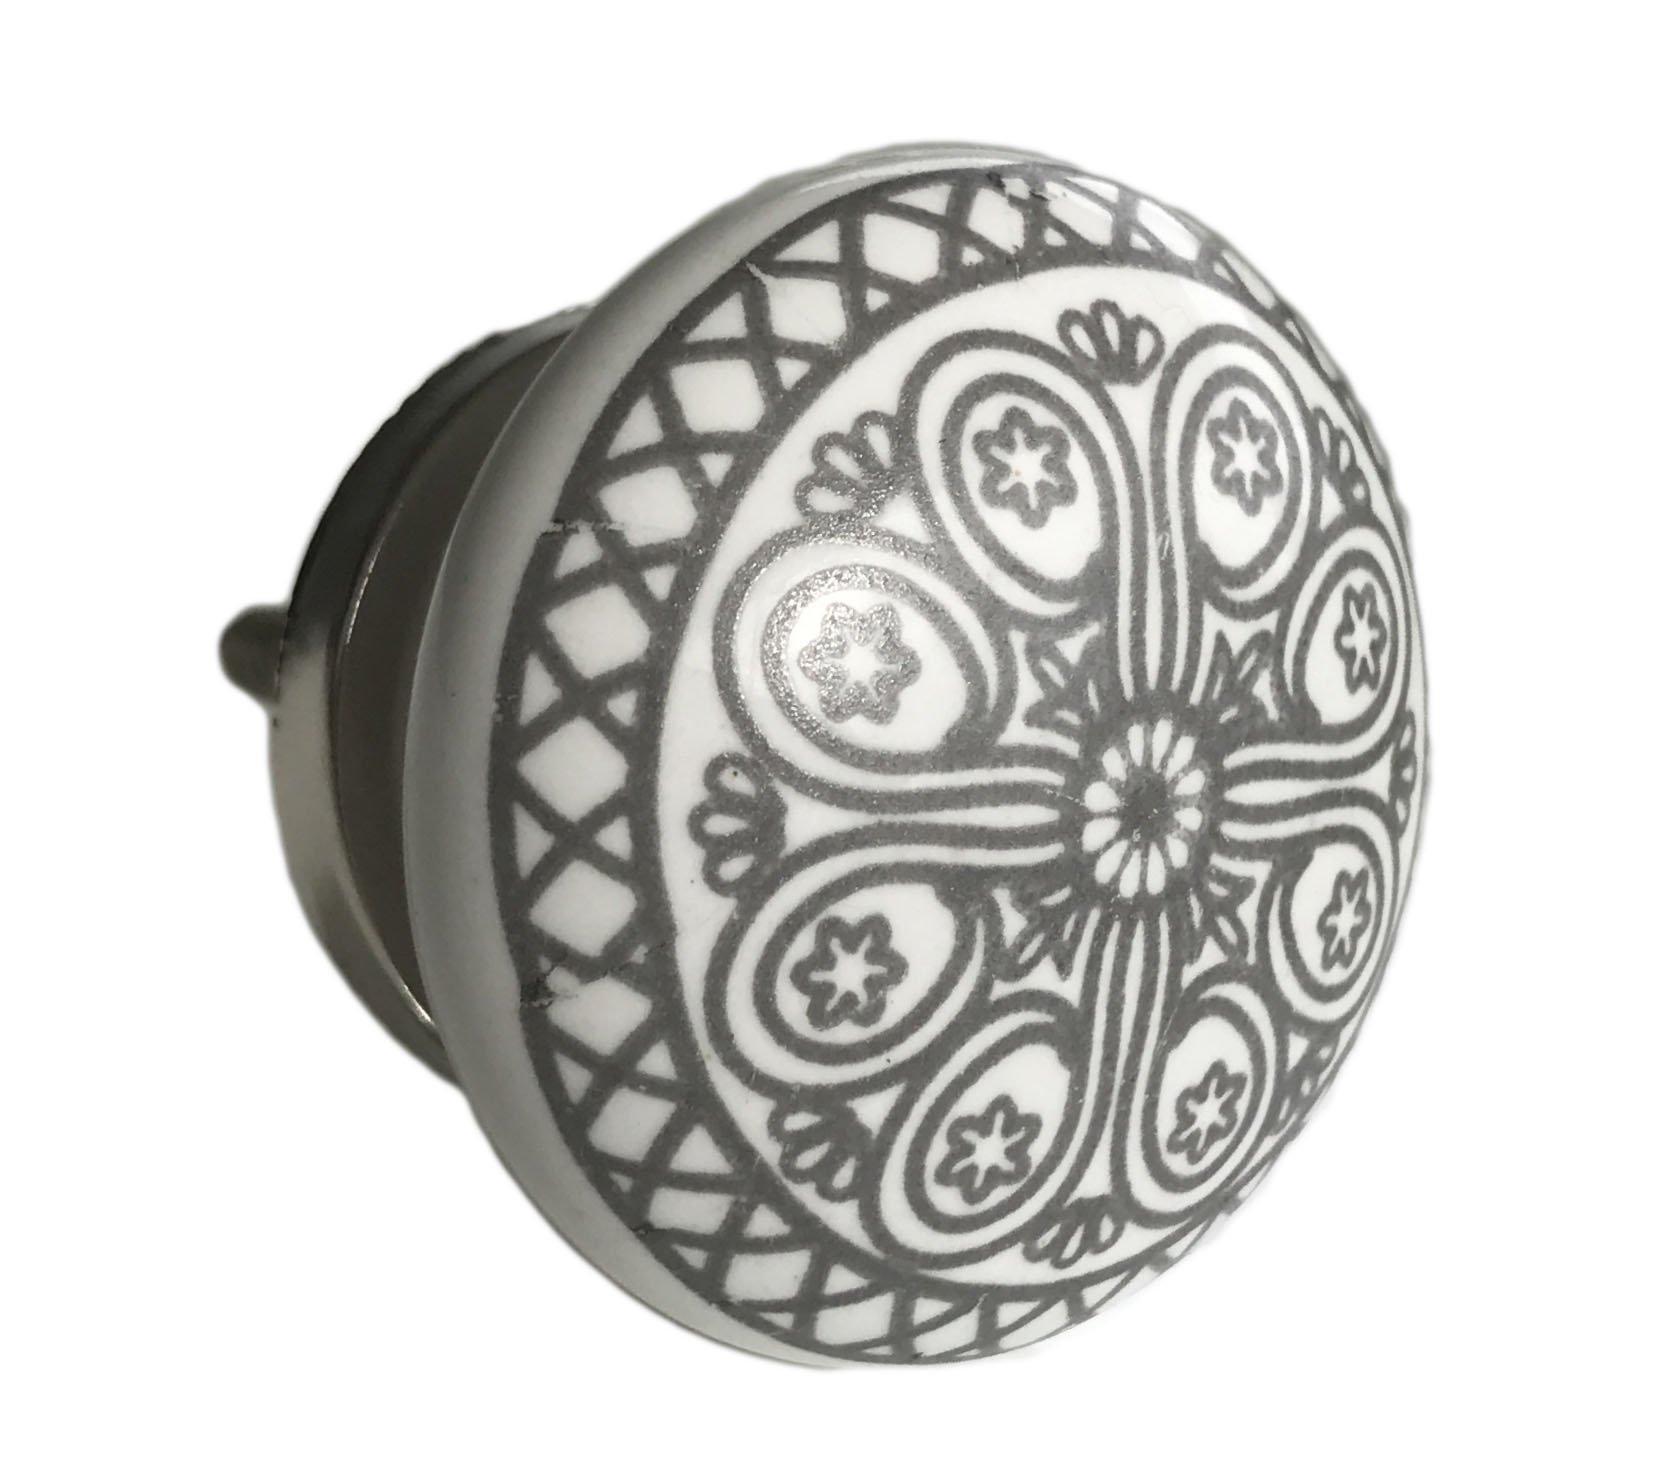 Grey Wheel Flat Knob Drawer Pull, Cabinet Pull, Dresser Knobs - Pack of 12